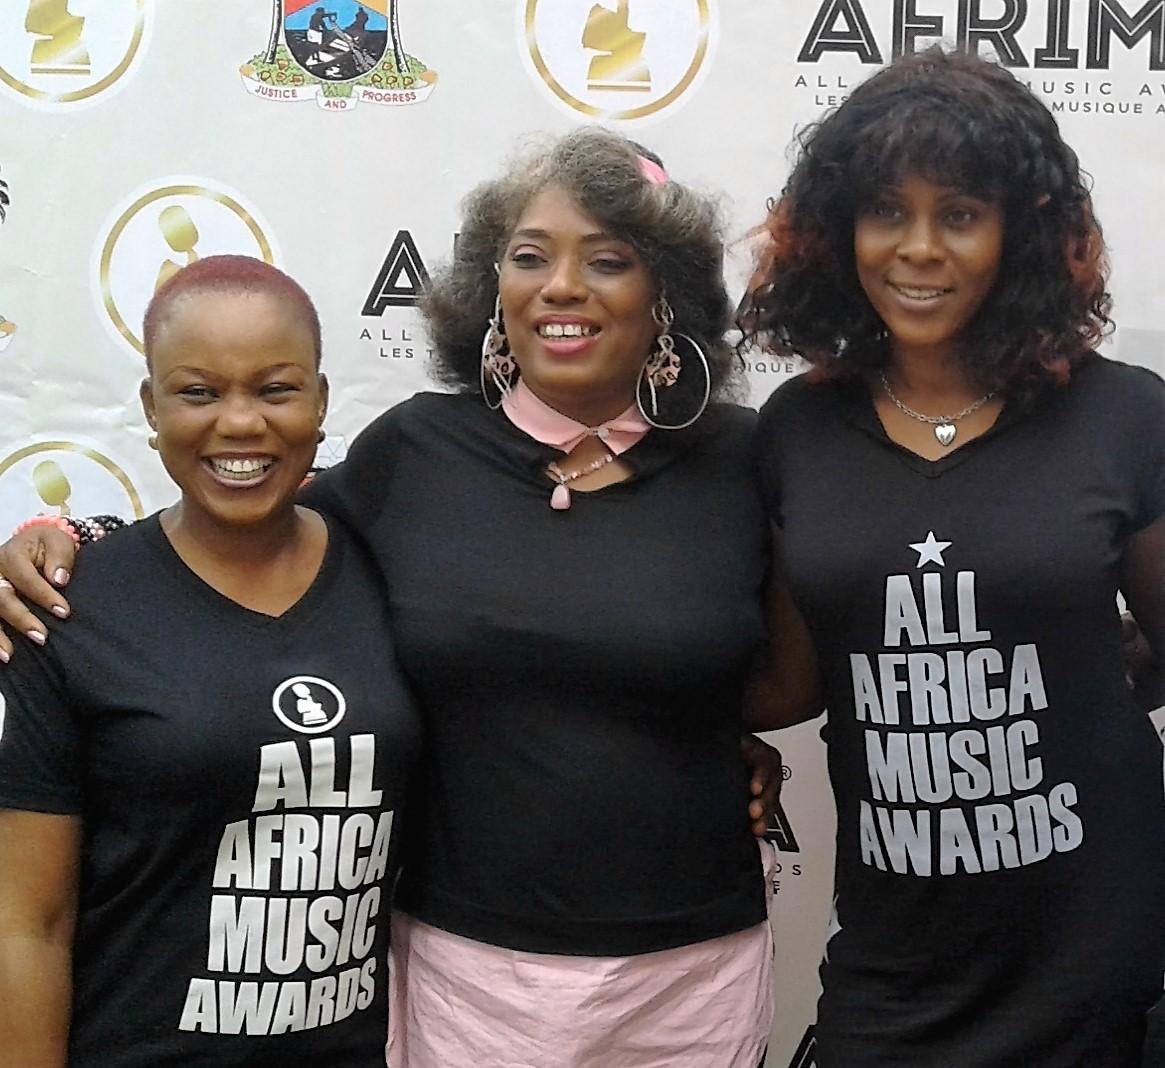 Founder, Felabration and Choreographer, Yeni Kuti (middle), Project Director, AFRIMA, Kemi Ashefon (left) and Associate Producer, AFRIMA, Adenrele Niyi (right) during the partnership agreement between Felabration 2016 and The All Africa Music Awards, AFRIMA 3.0 in Lagos, recently.